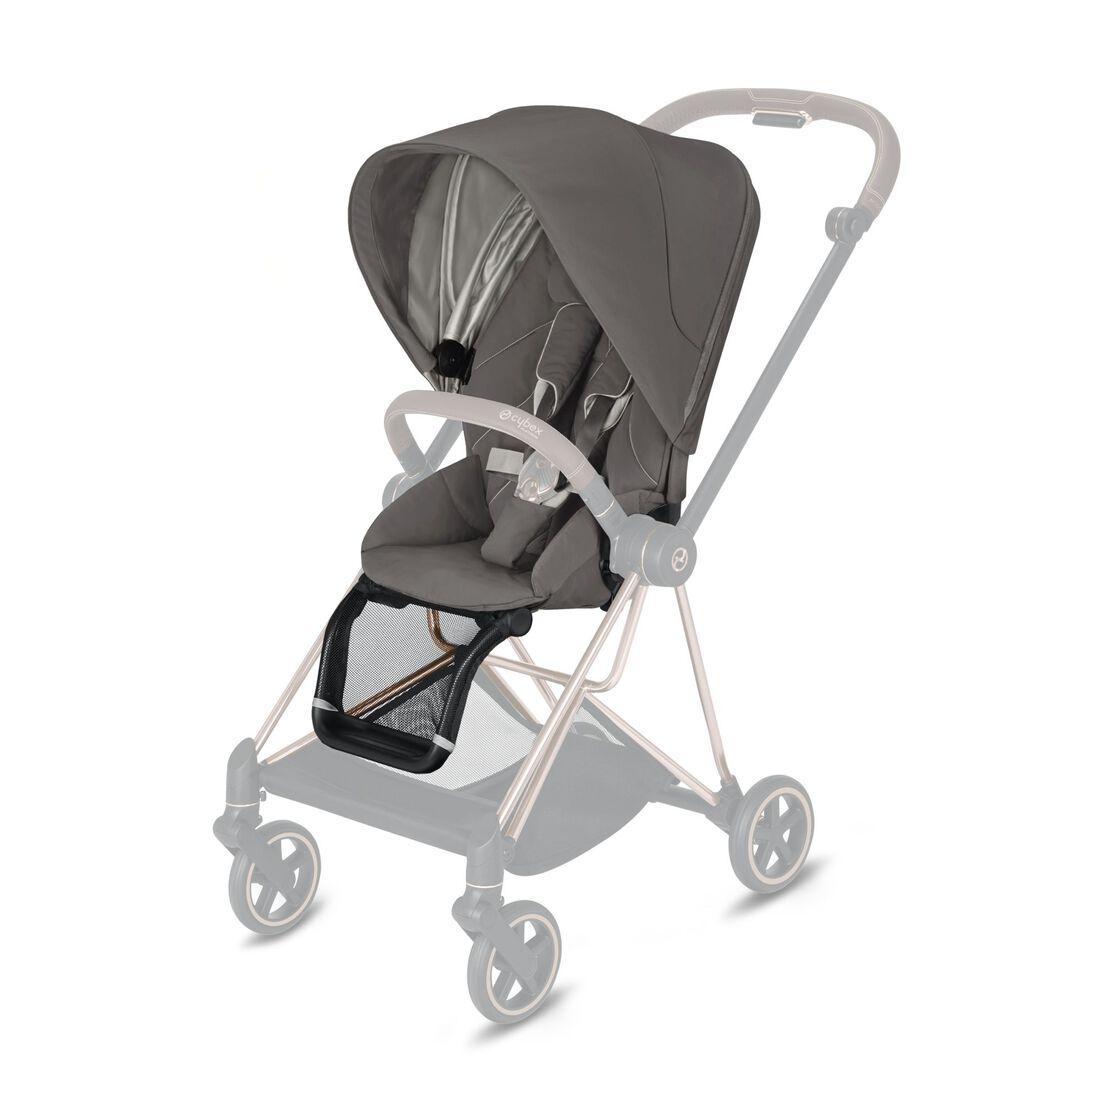 CYBEX Mios Seat Pack - Soho Grey in Soho Grey large image number 1